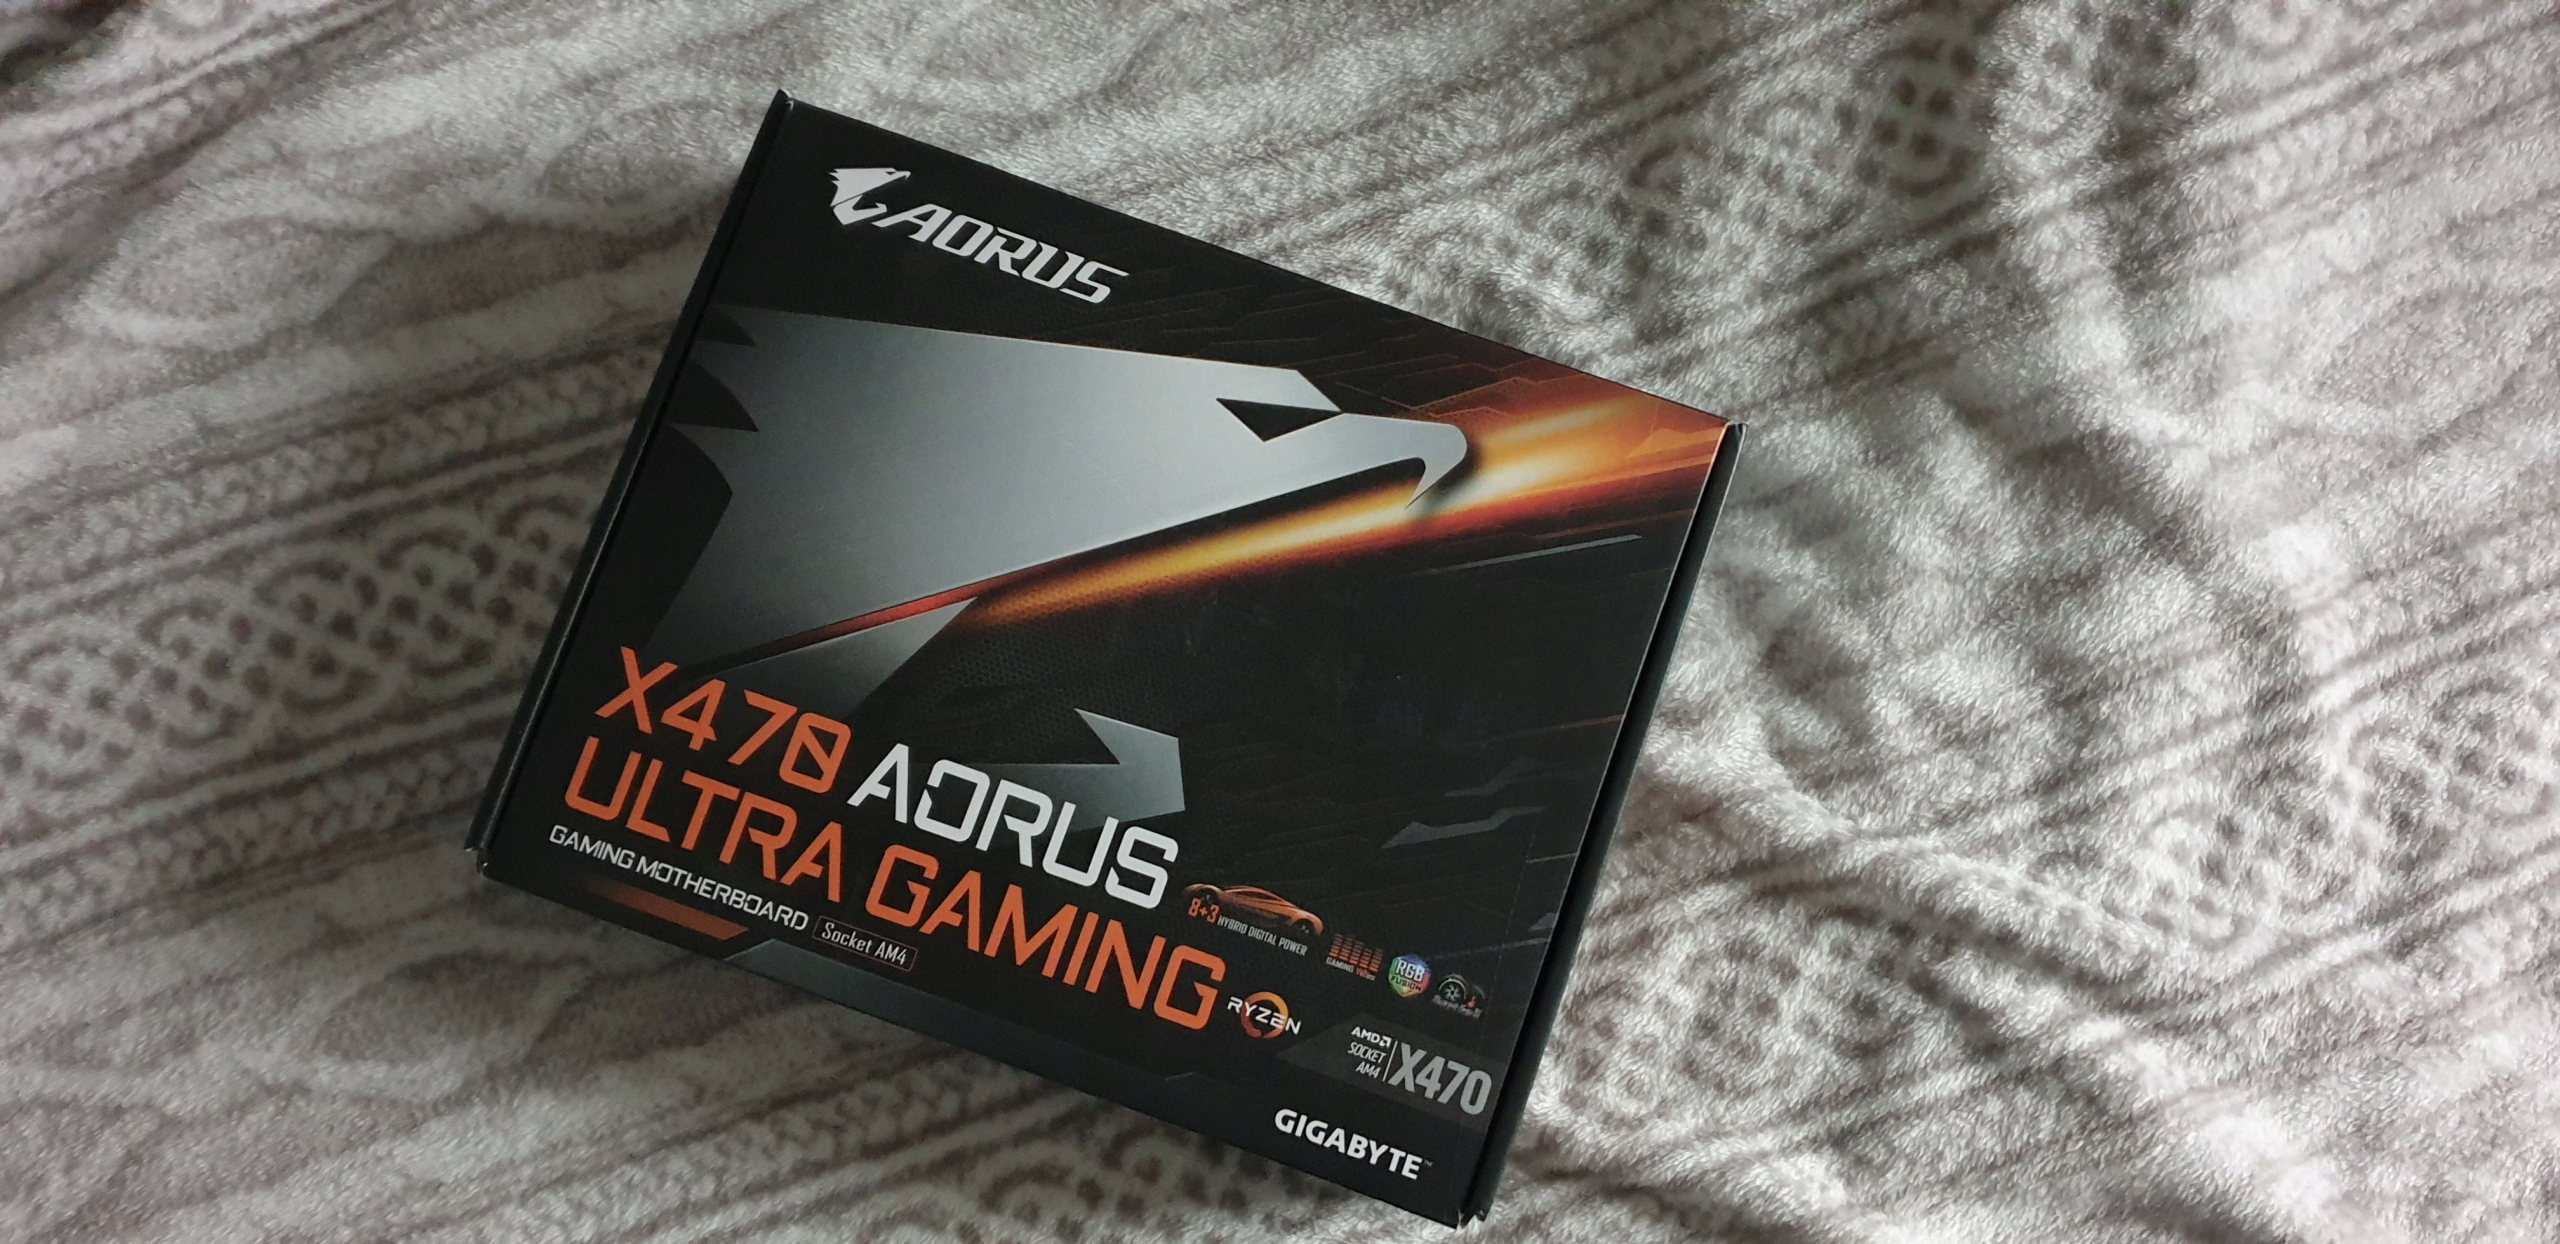 Gigabyte X470 AORUS ULTRA GAMING - 7684644575 - oficjalne